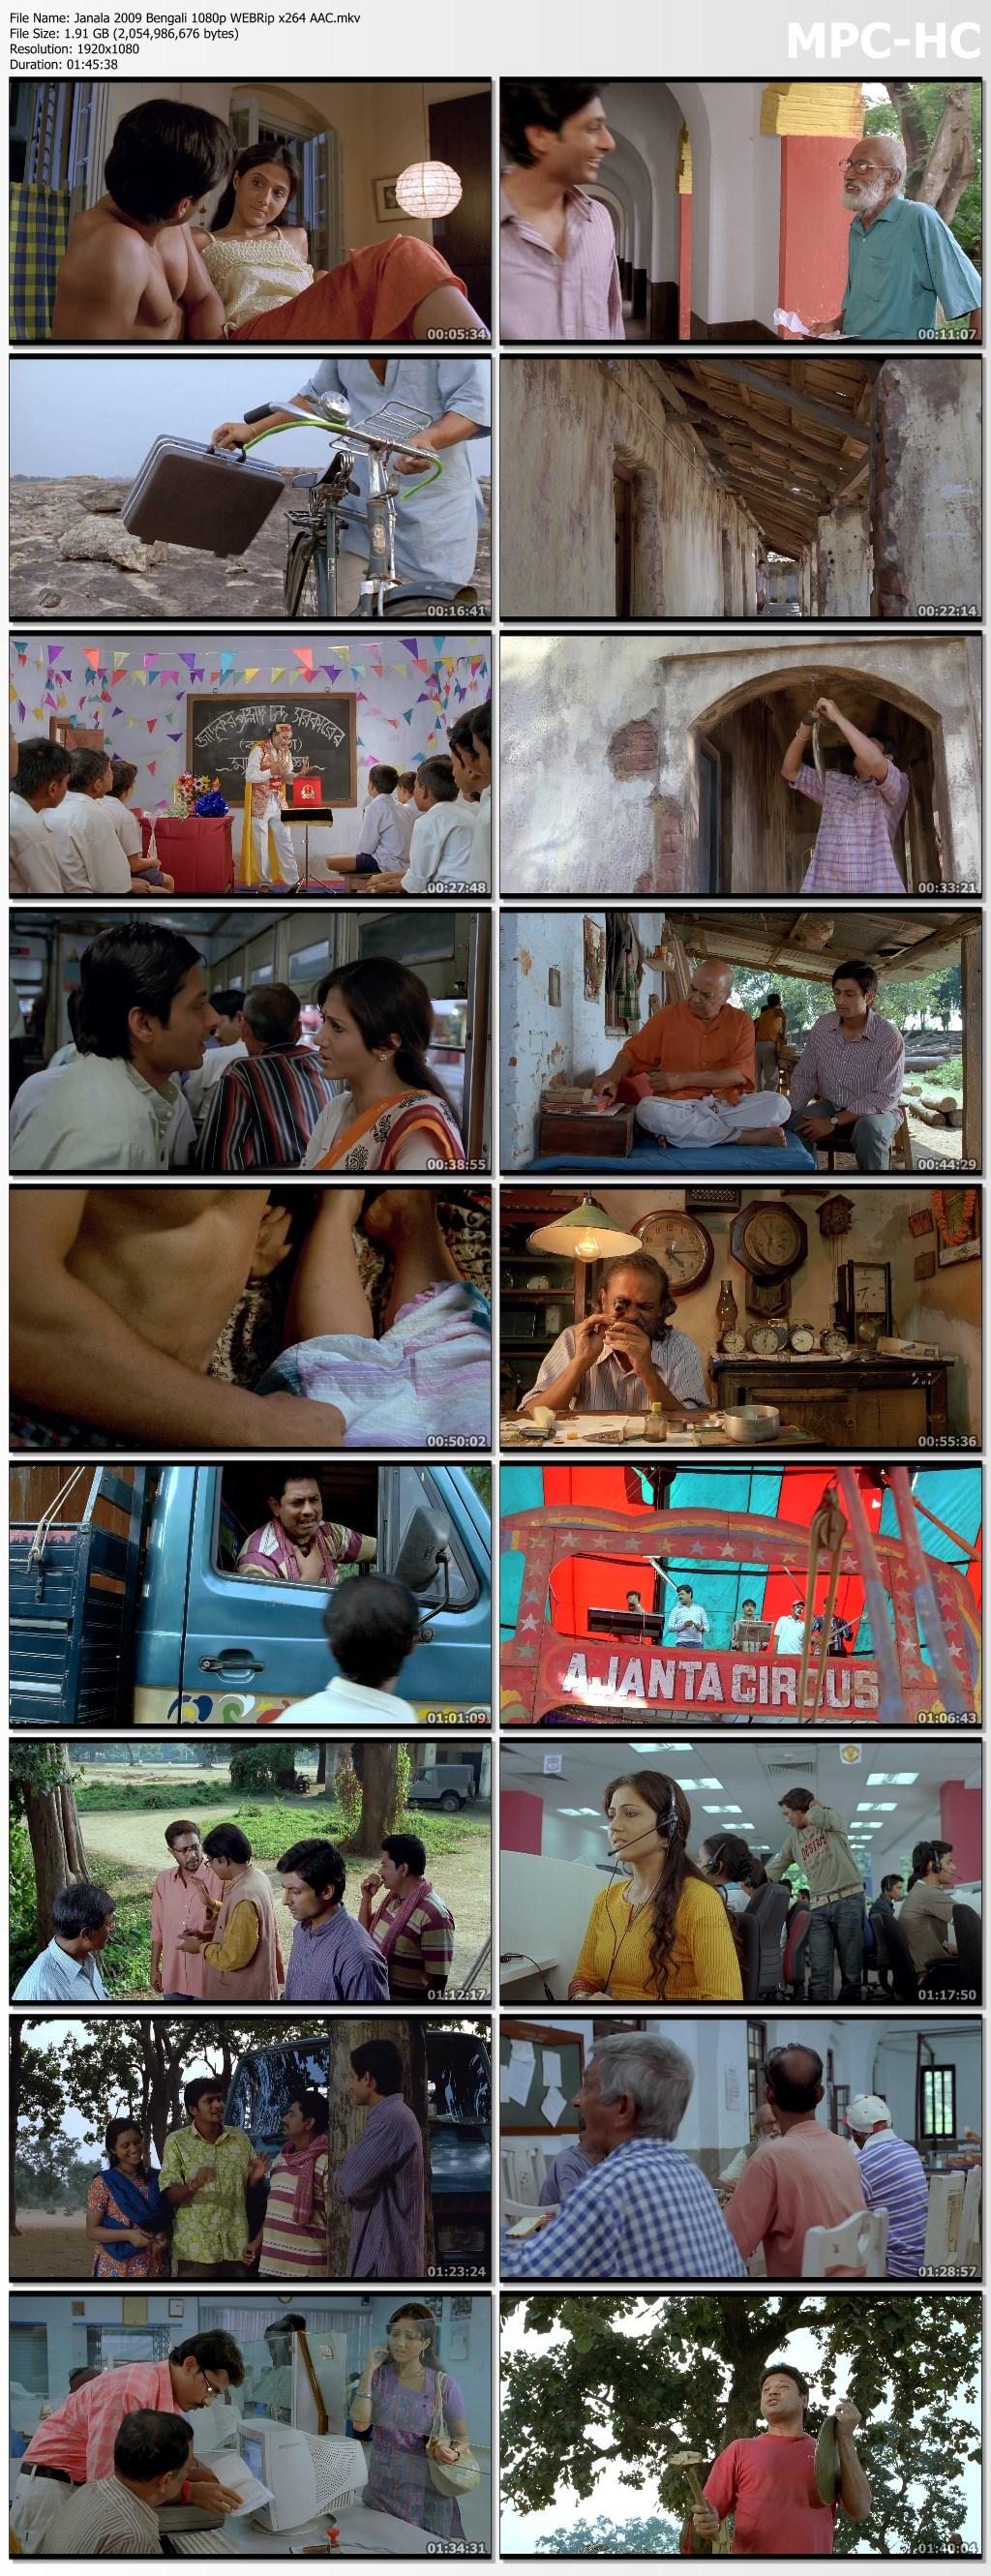 Janala 2009 Bengali 1080p WEBRip x264 AAC.mkv thumbs